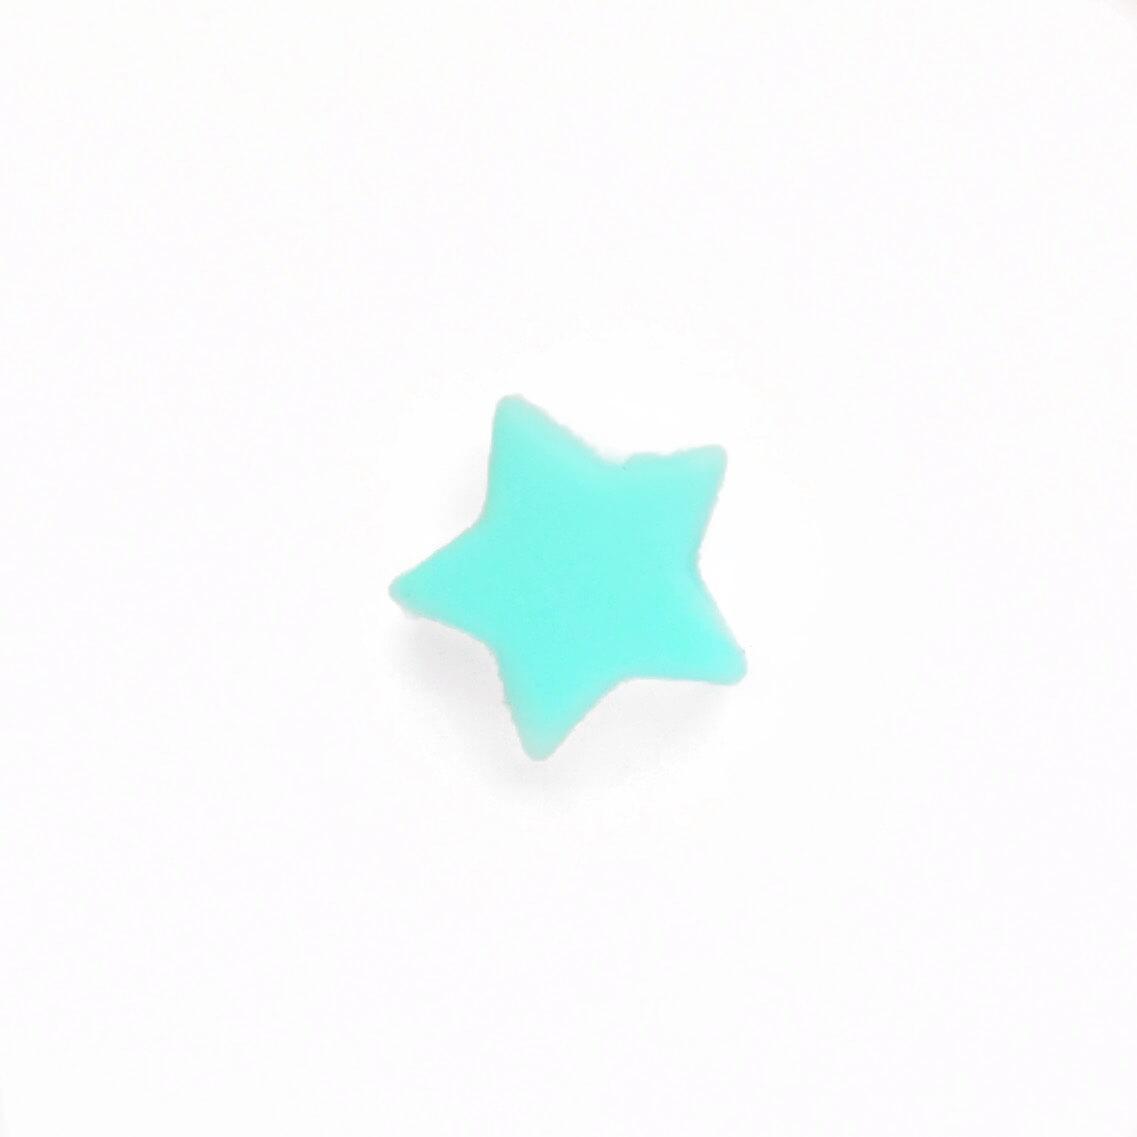 Мини звездочка (тиффани) бусина из пищевого силикона